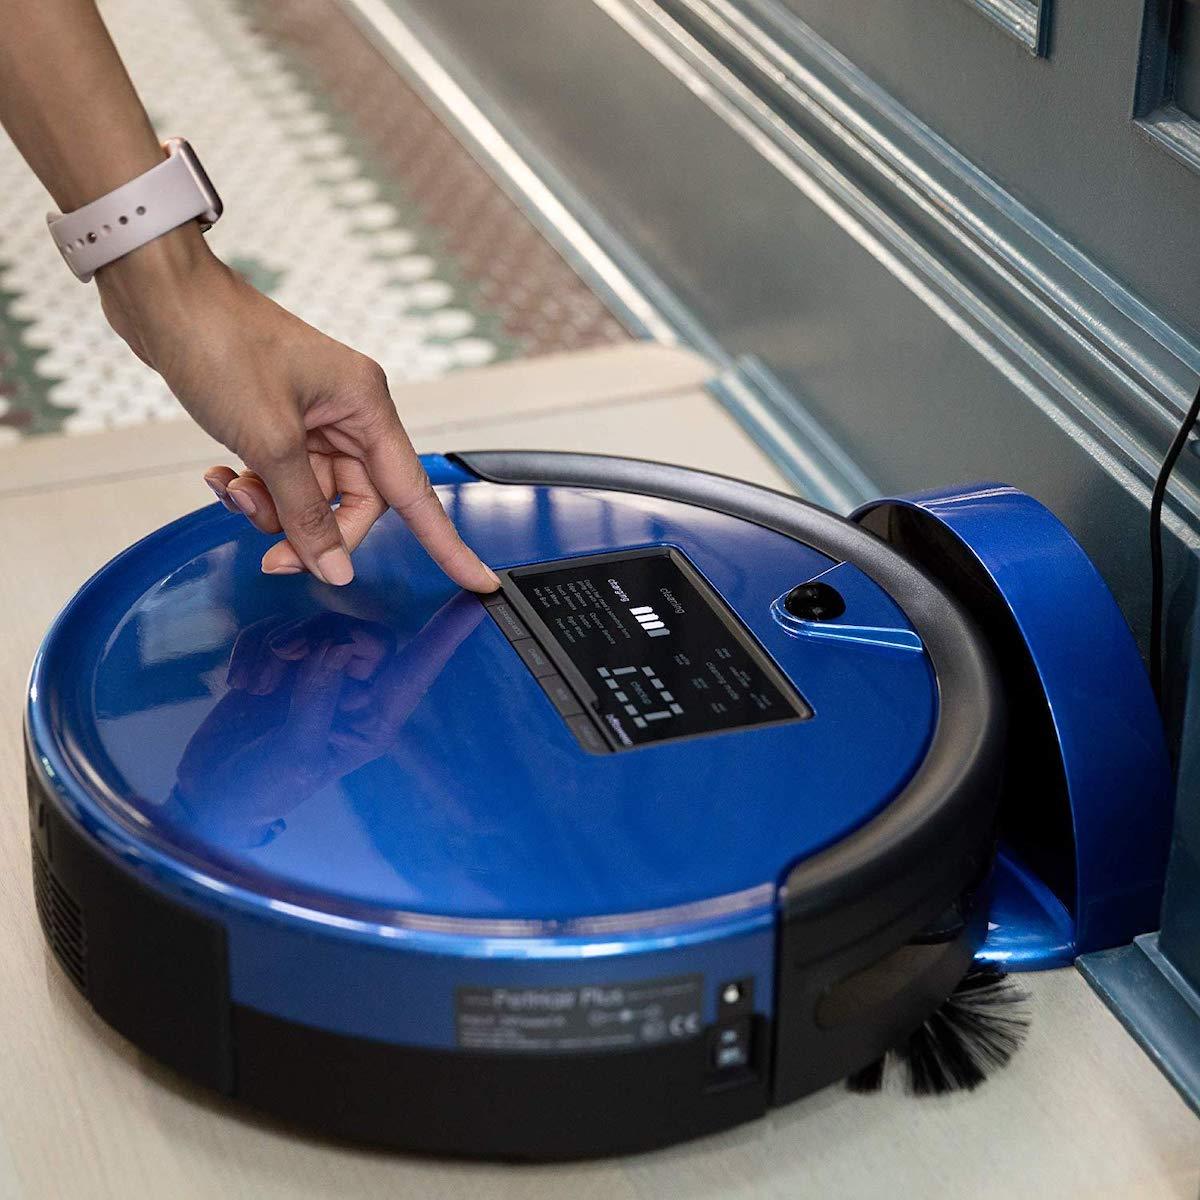 bObsweep bObi Pet Robotic Vacuum Cleaner & Mop in Blue